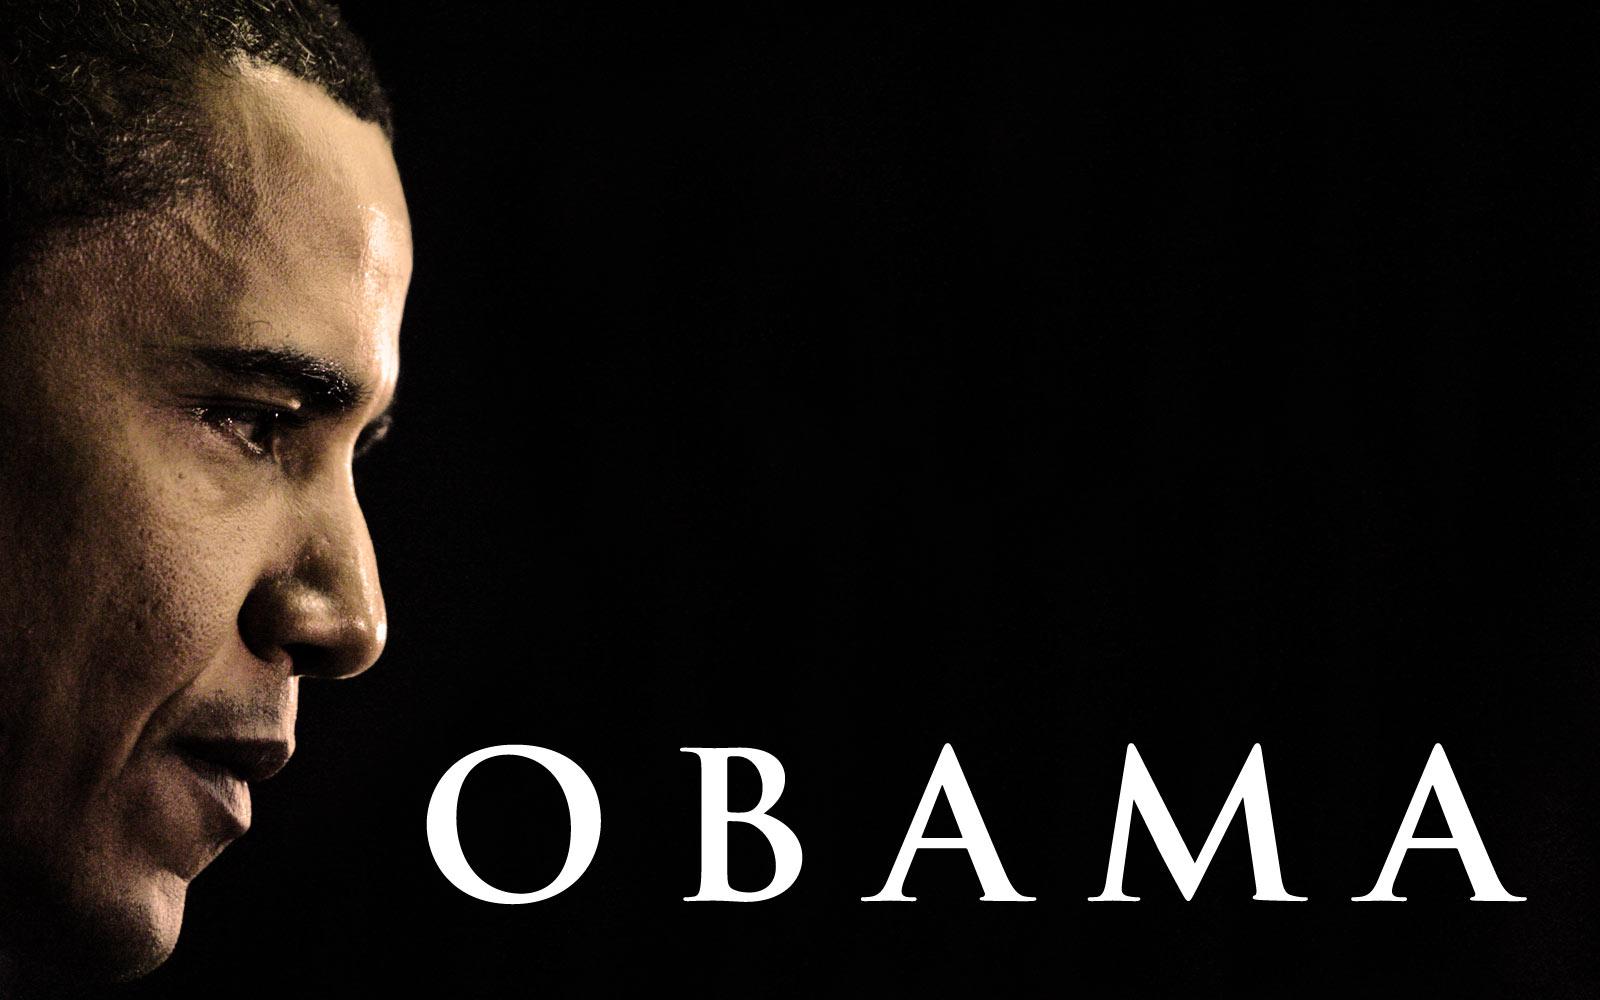 Barack Obama Wallpaper Photos 1600x1000